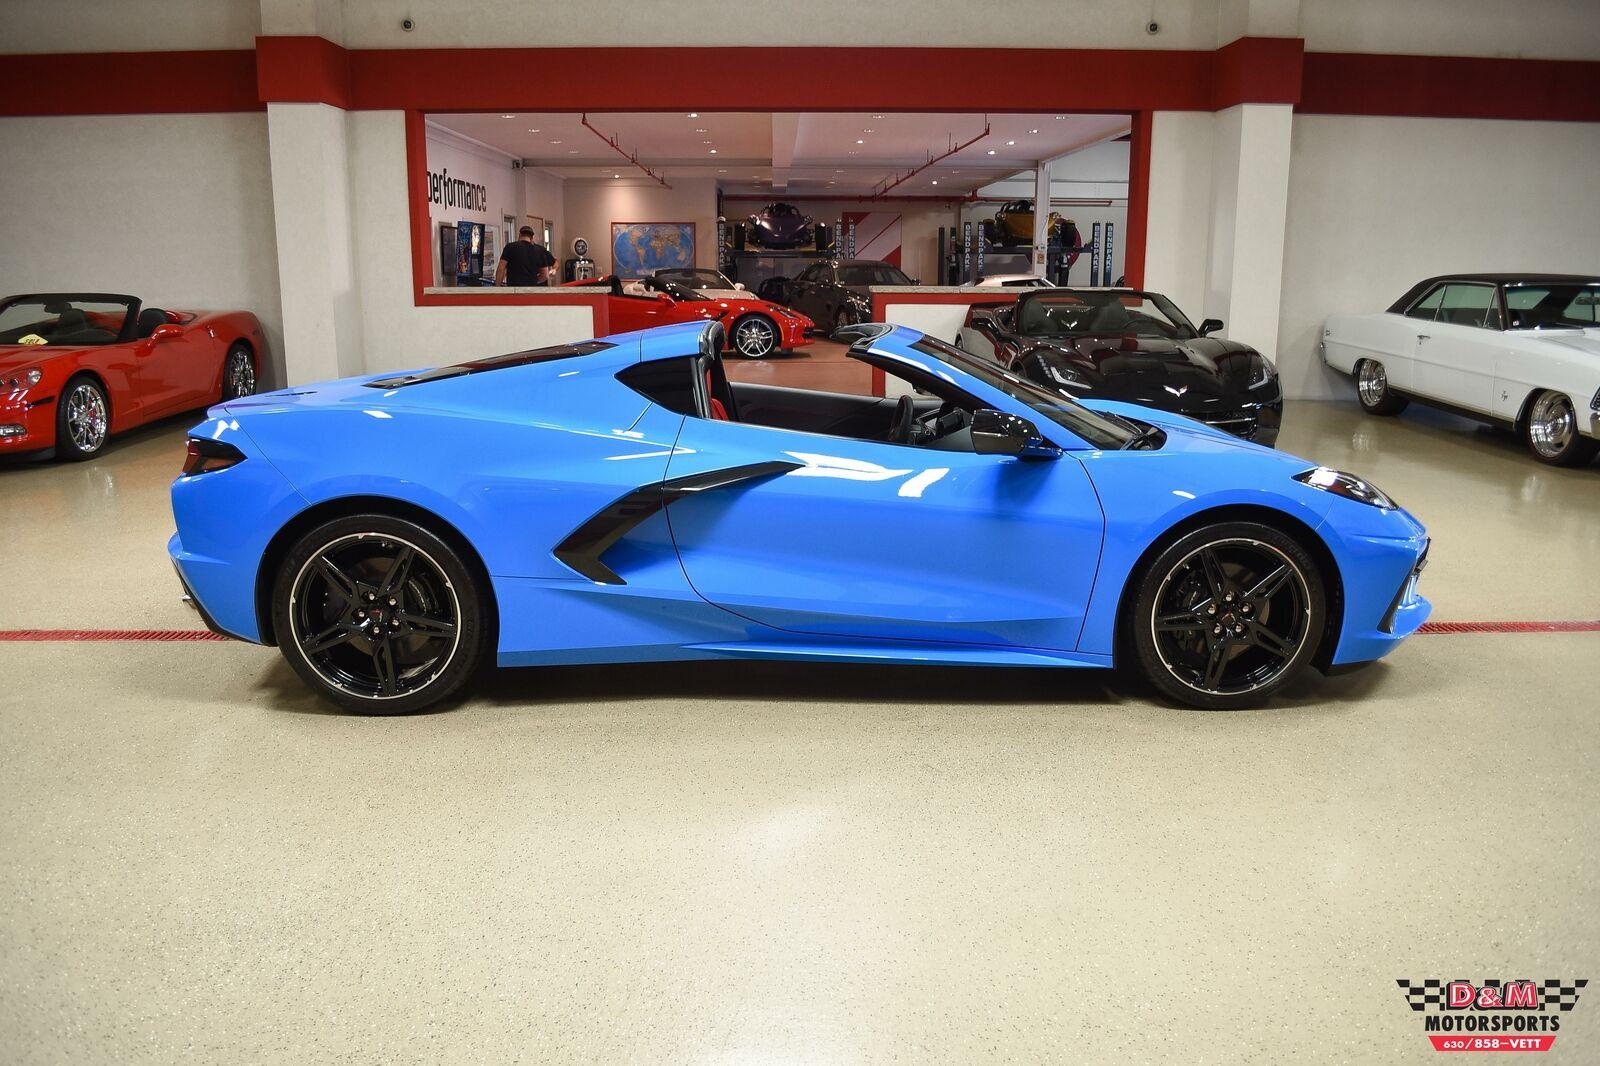 2020 Blue Chevrolet Corvette Stingray  | C7 Corvette Photo 7